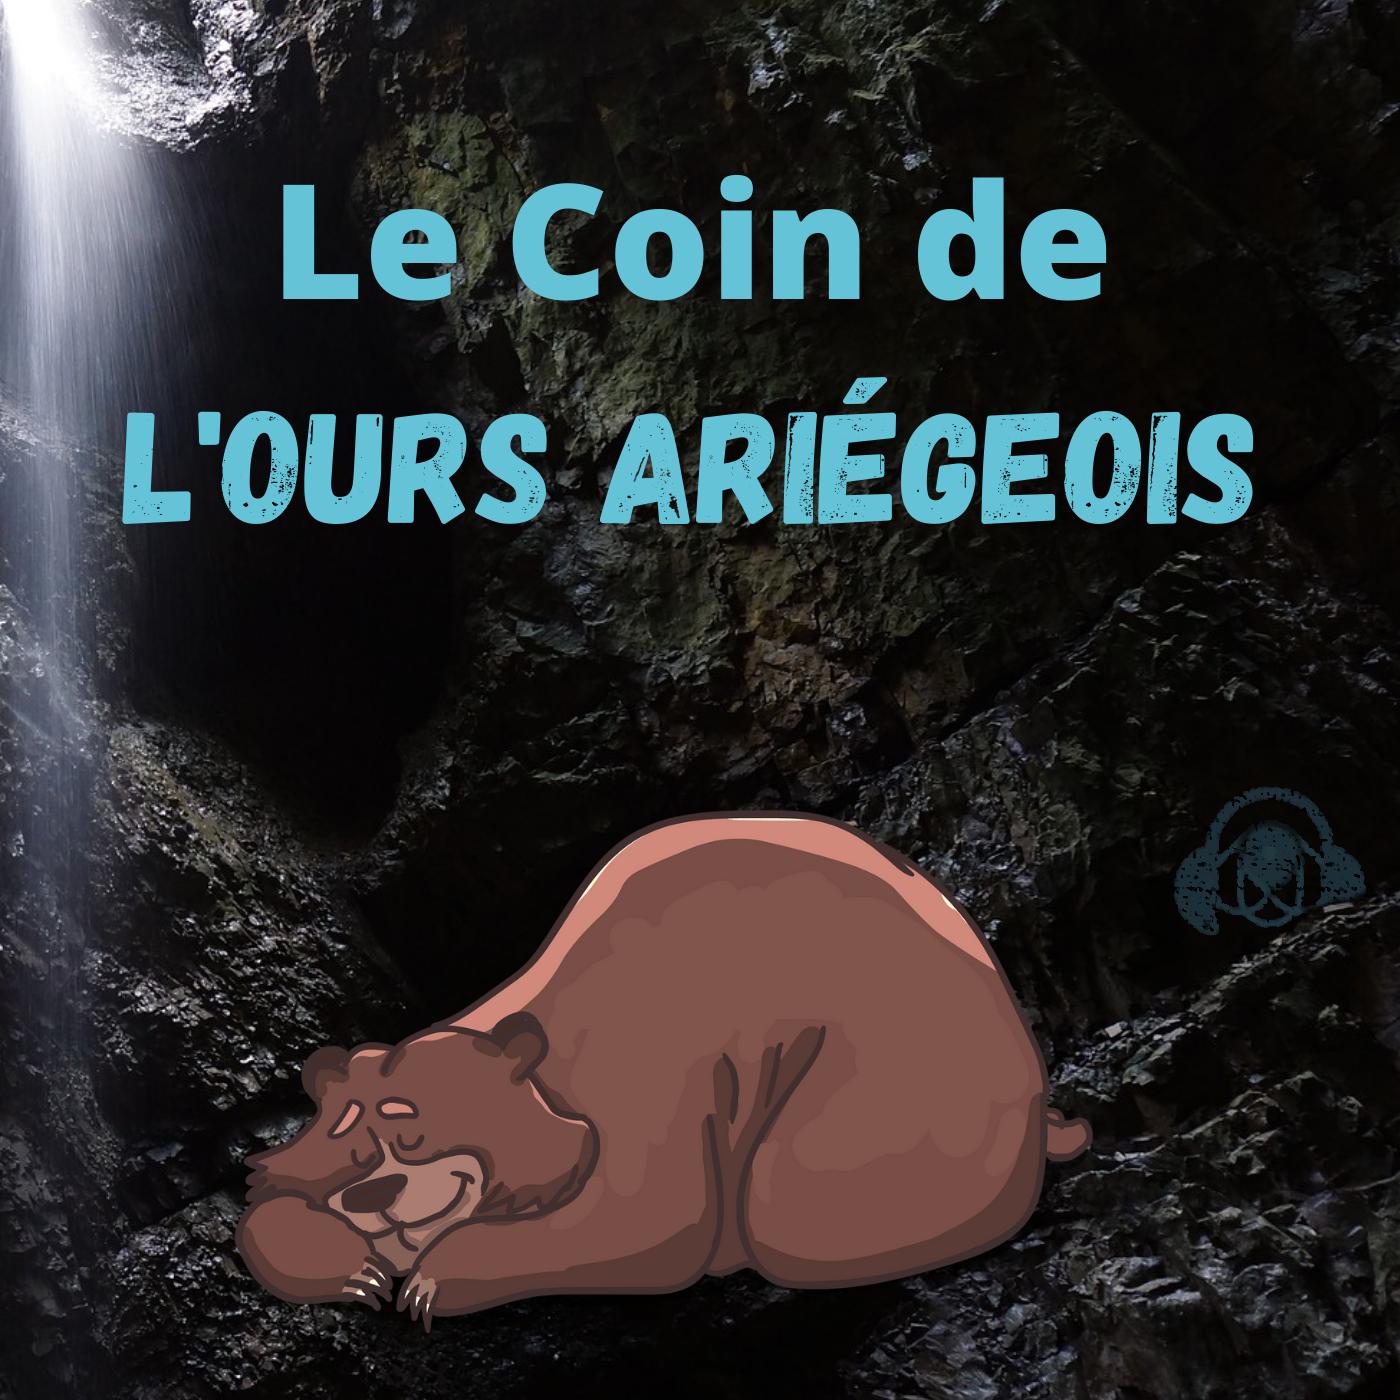 LE COIN DE L'OURS ARIÉGEOIS S2E05 - Mnemosyne - Femmes